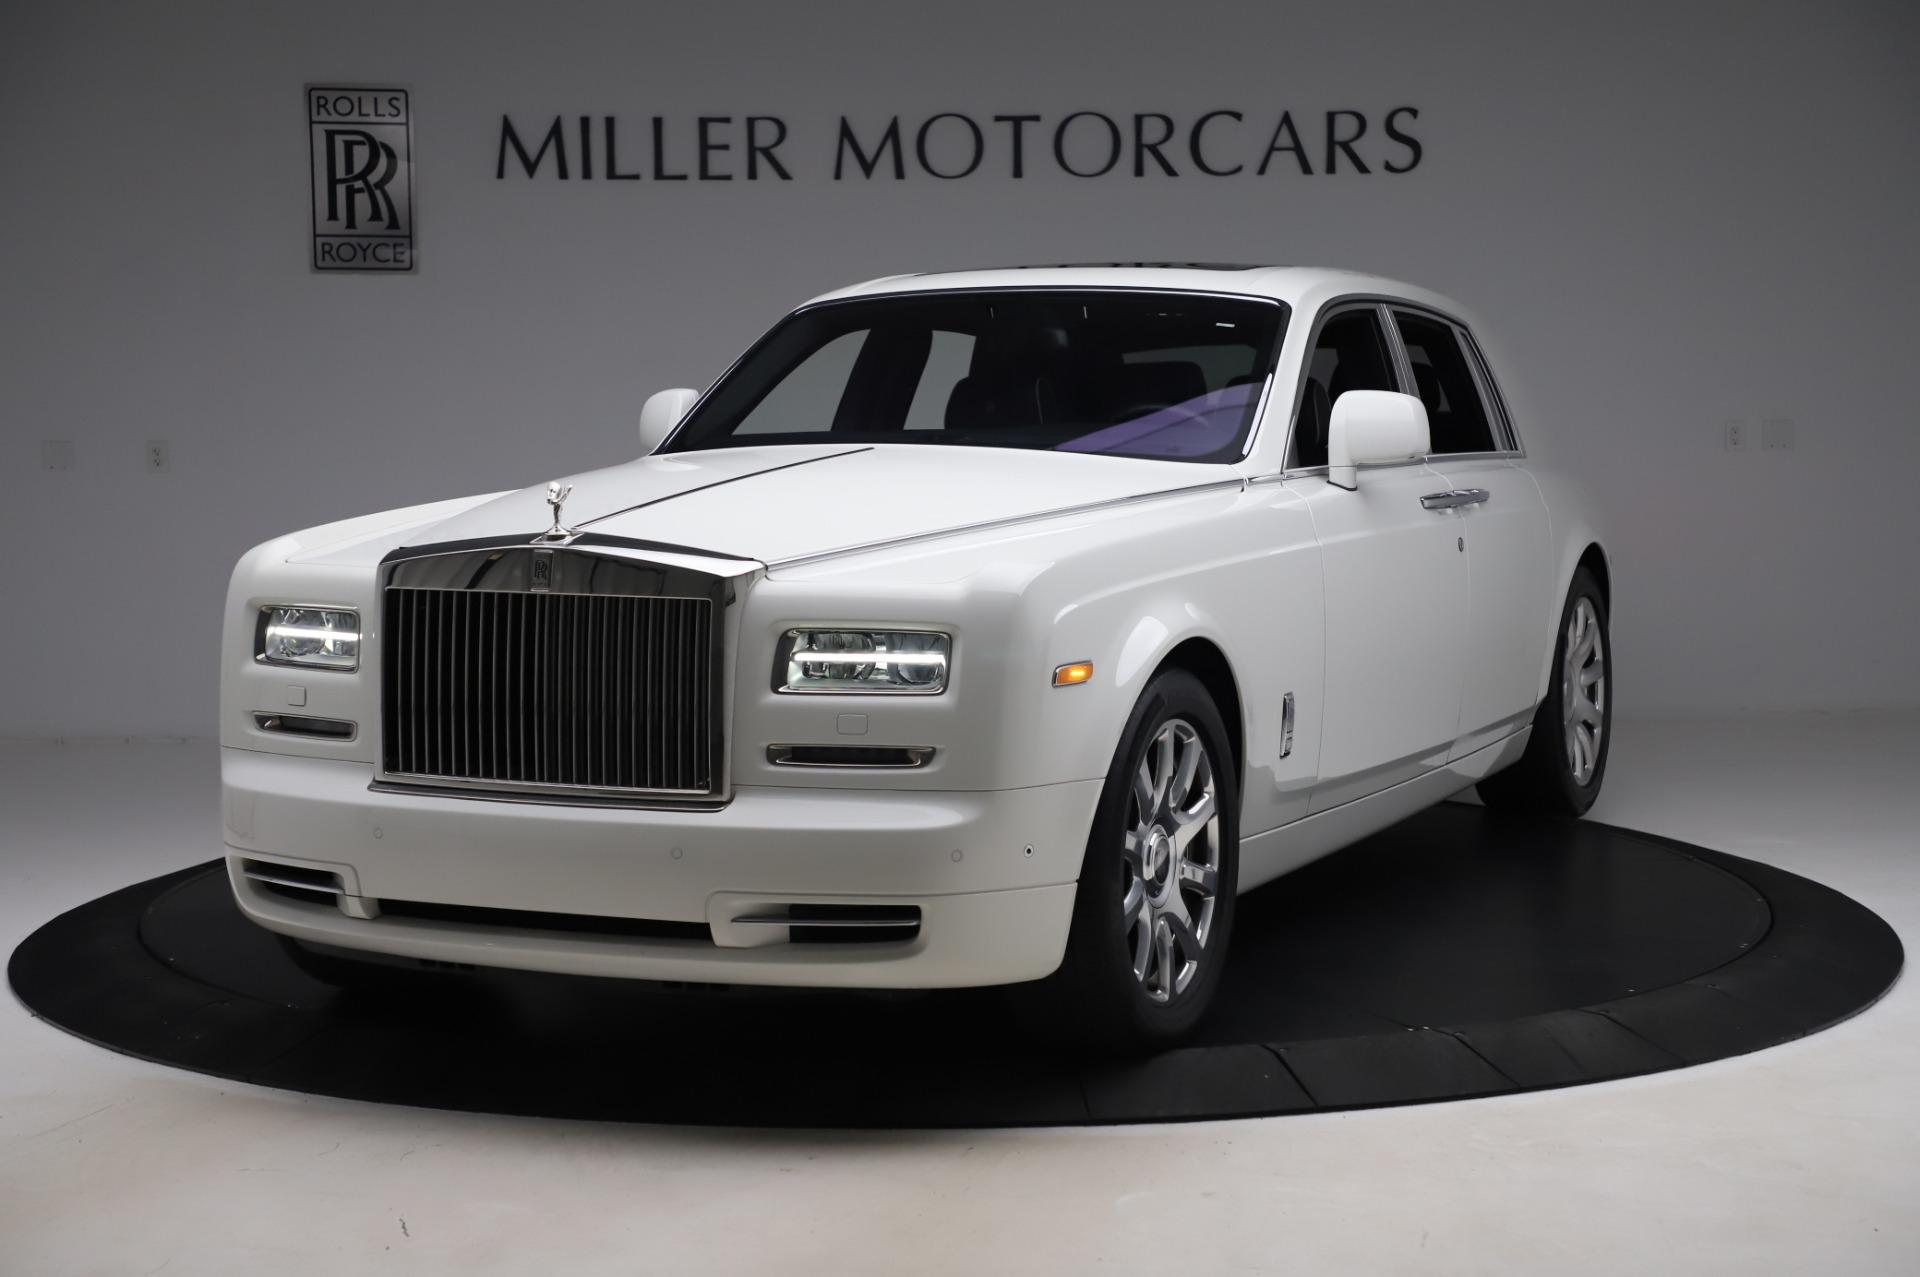 Used 2014 Rolls-Royce Phantom for sale Sold at Bugatti of Greenwich in Greenwich CT 06830 1